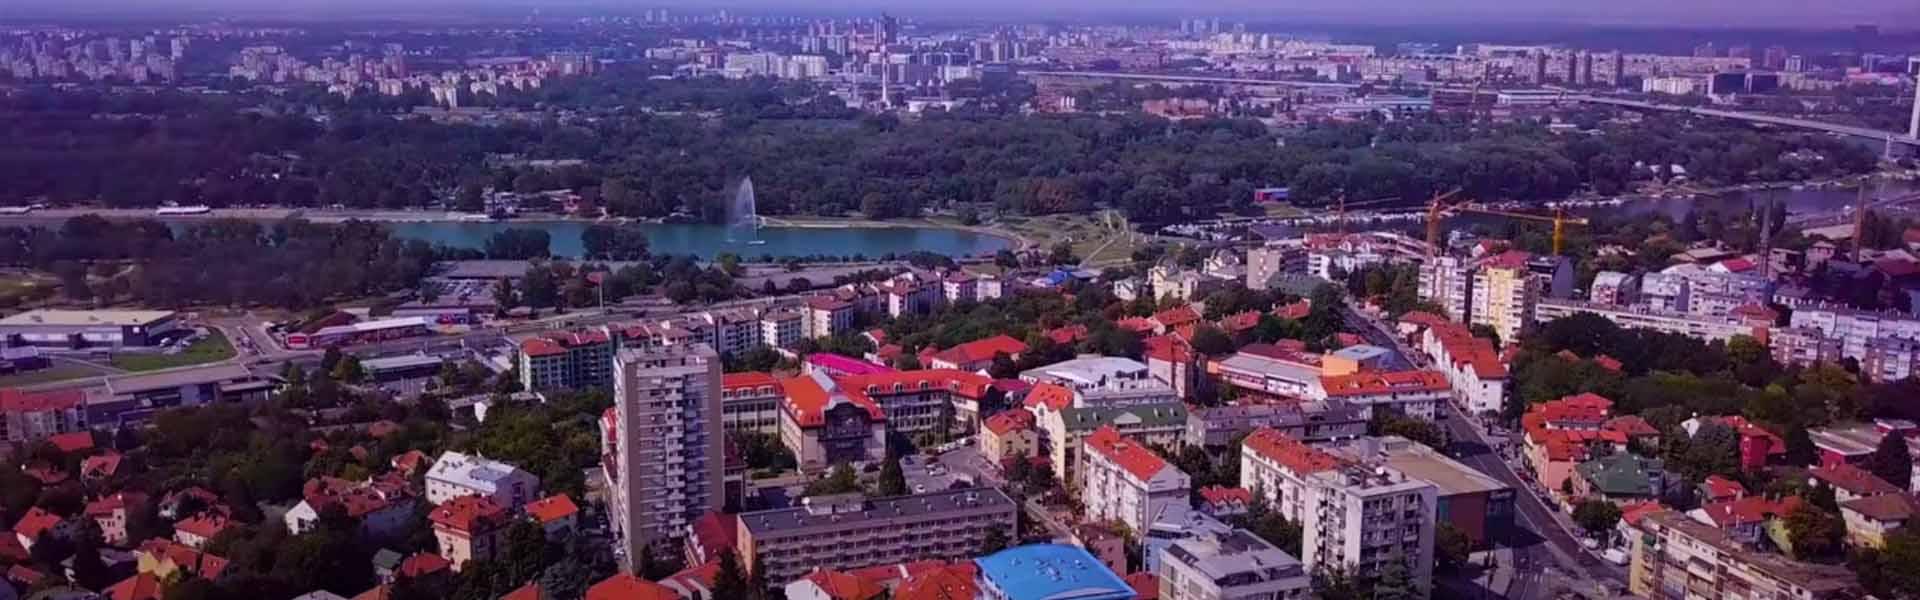 Dostava hrane Čukarica | Beograd